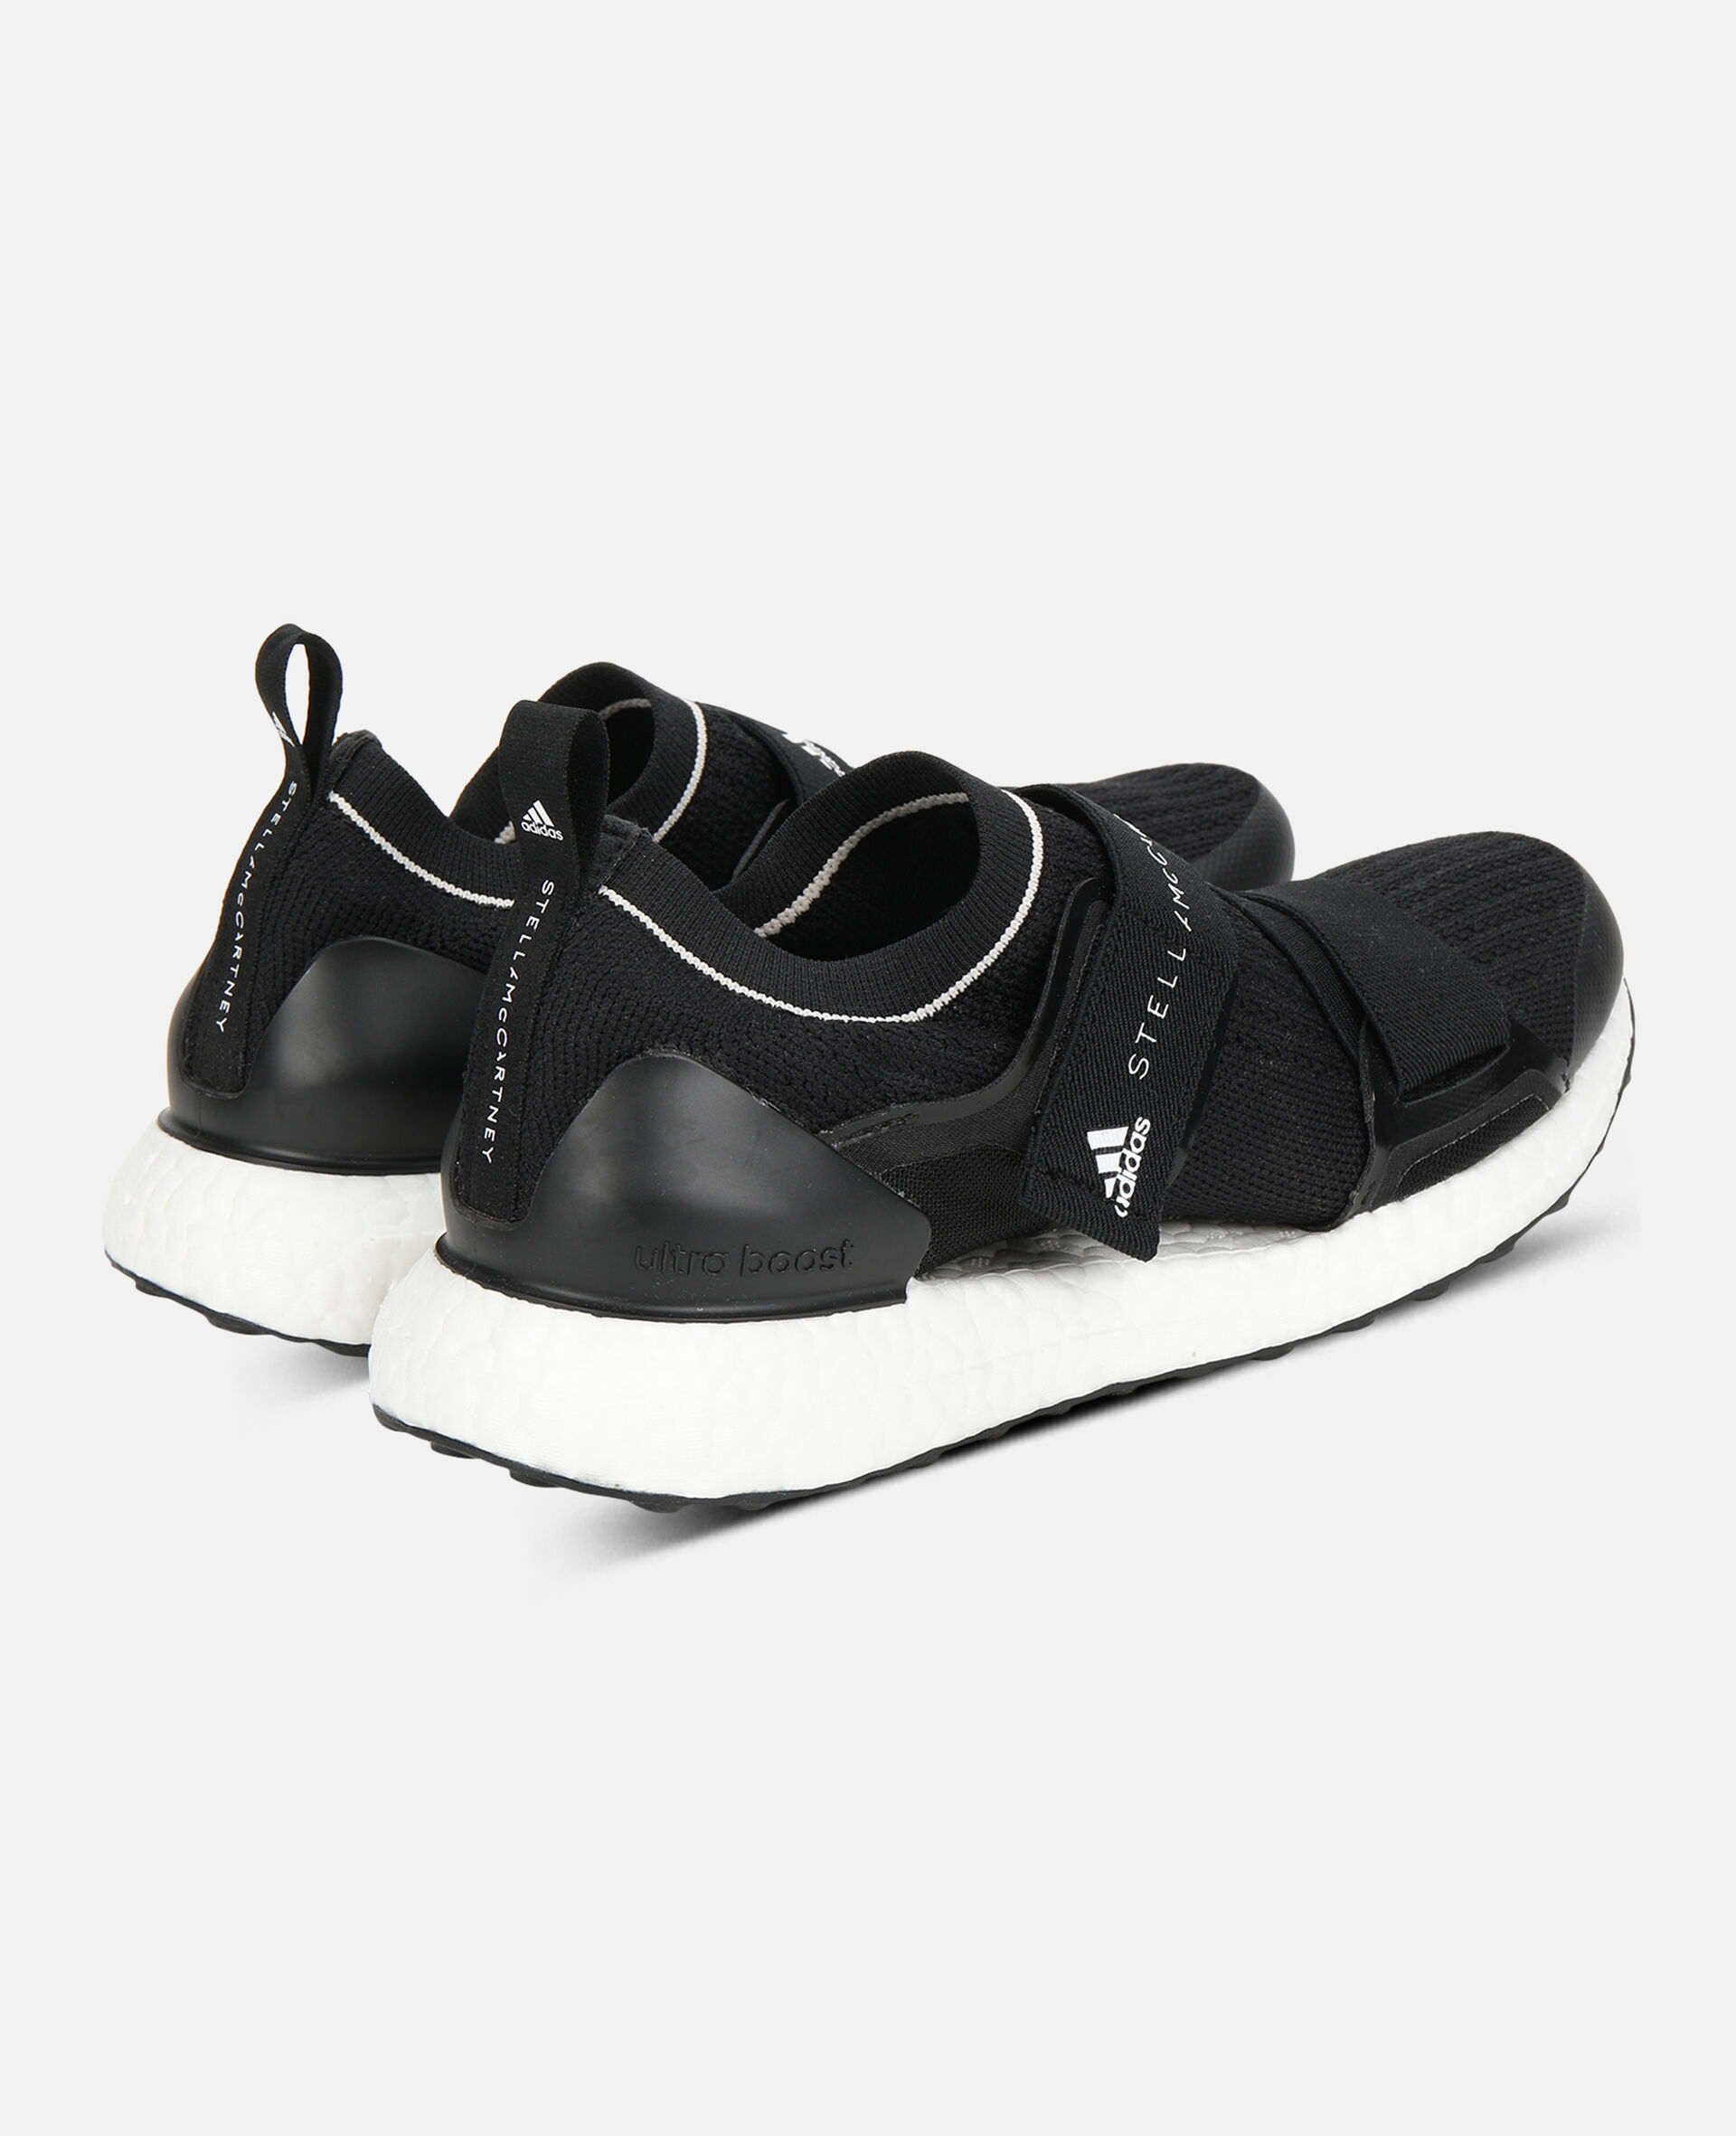 Black Ultraboost X Sneakers-Black-large image number 4